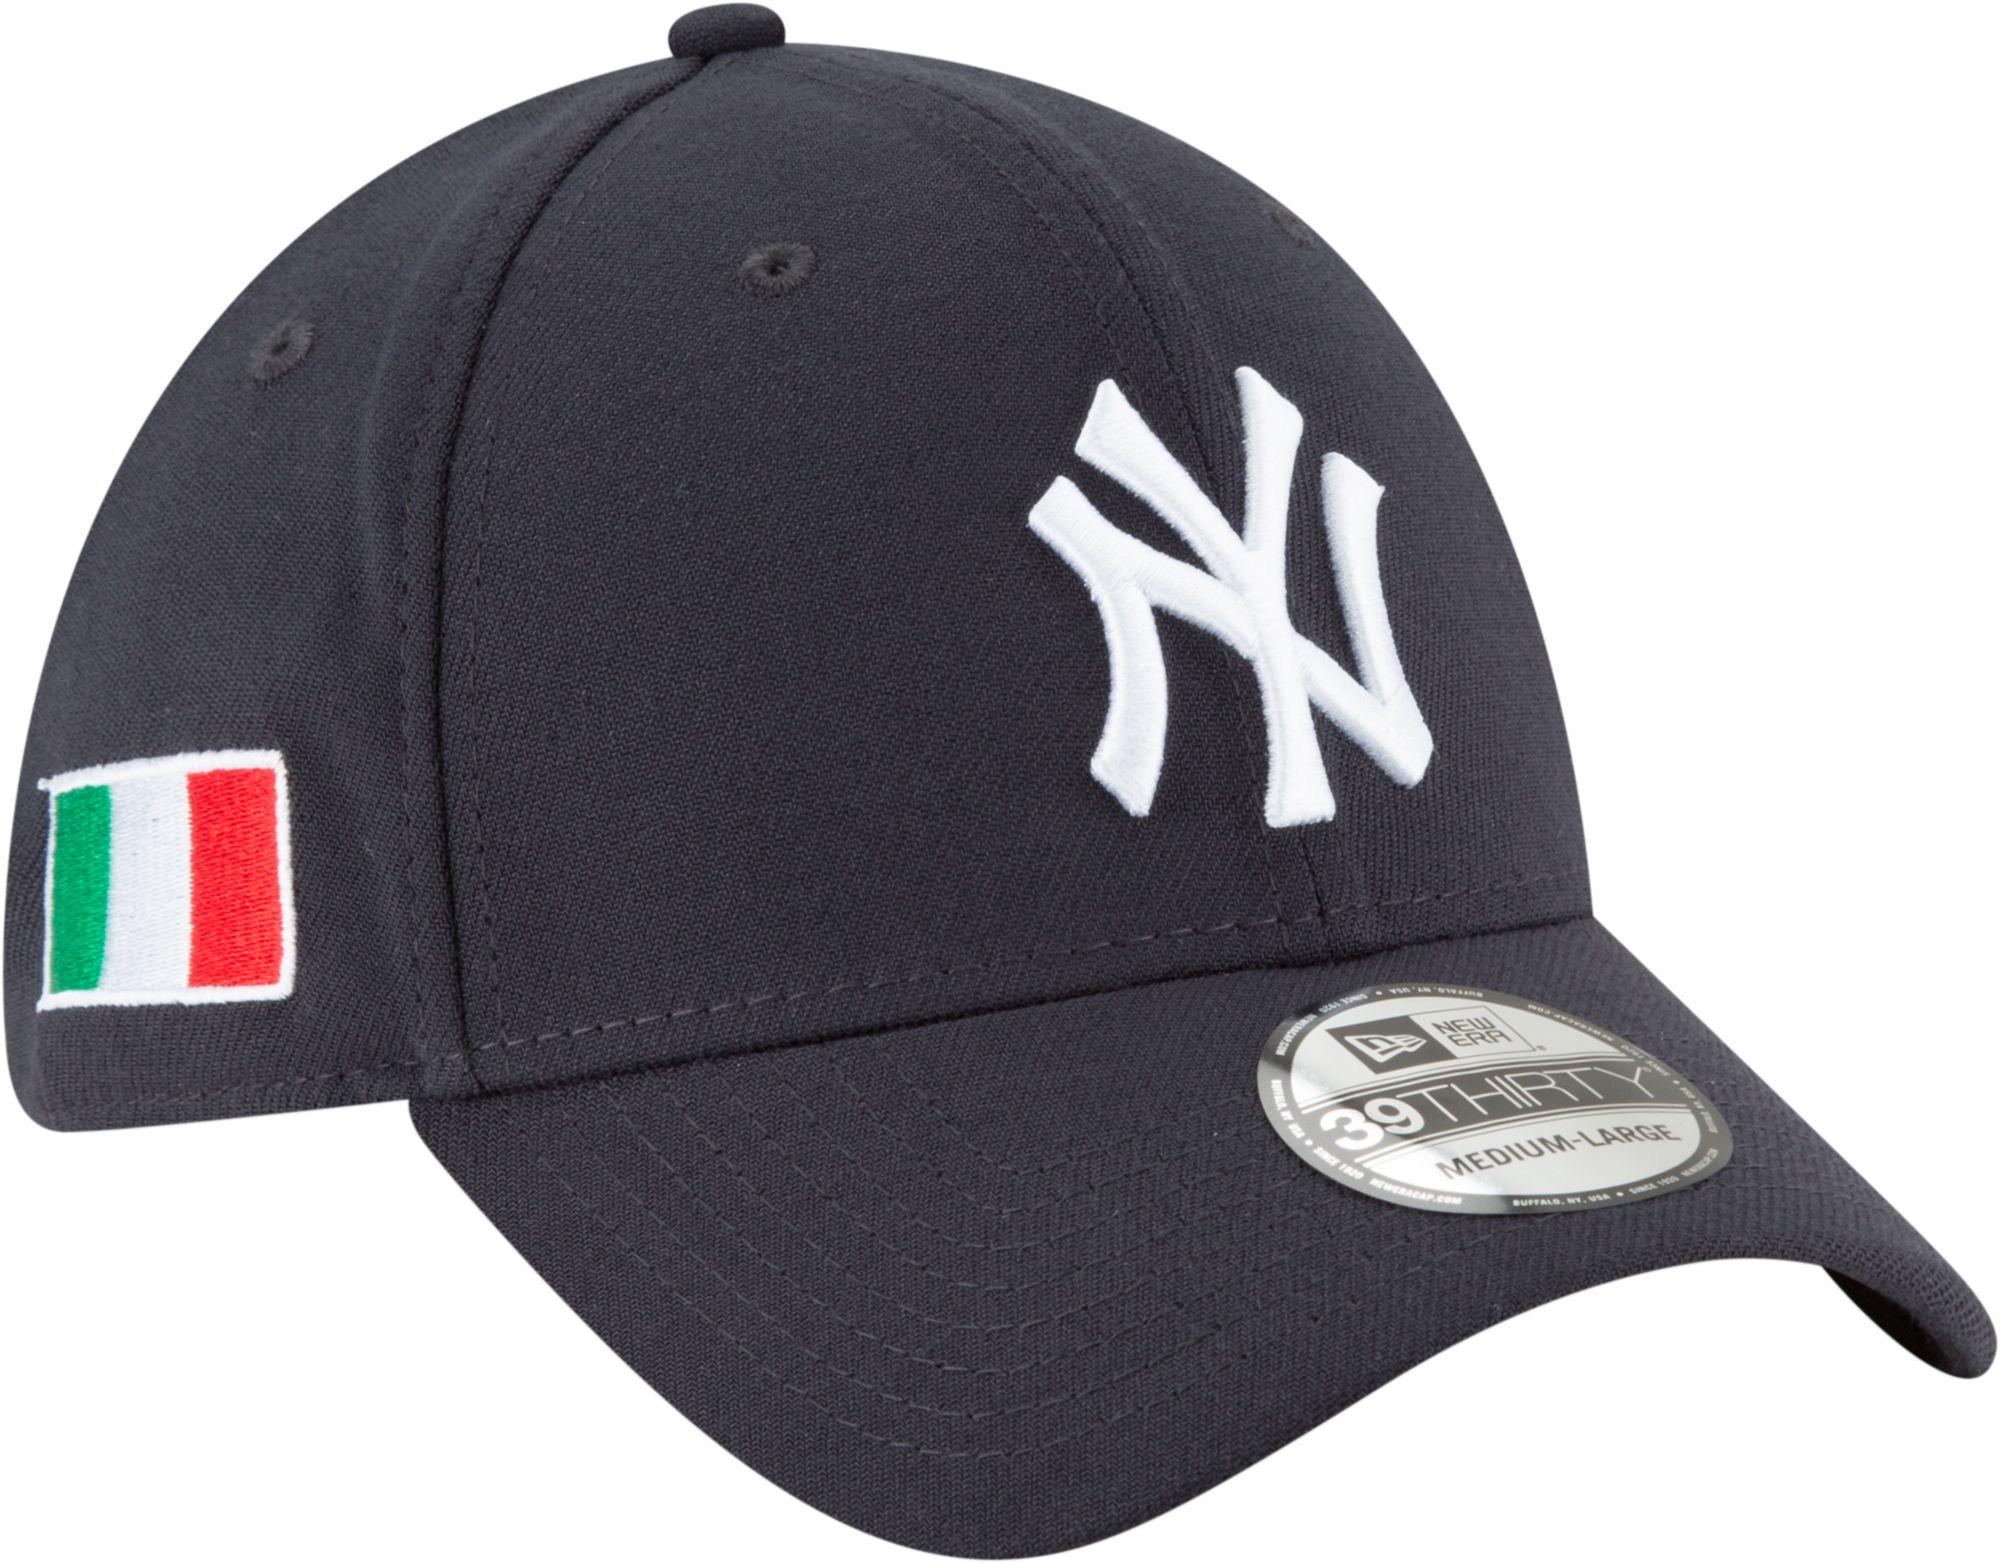 ... italy new era mens new york yankees 39thirty stretch fit hat w italian  flag patch 2cec5 1c1f67353eba